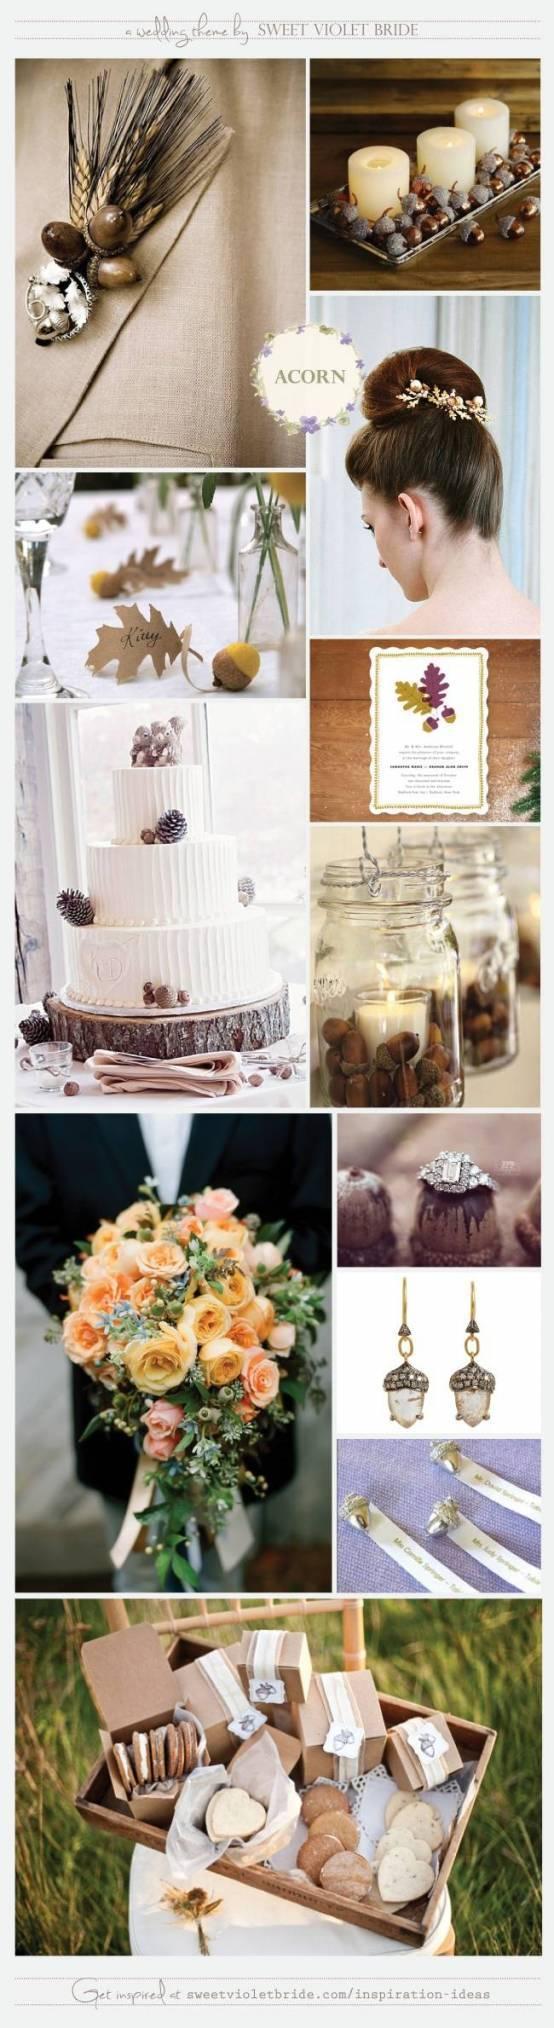 Wedding Inspiration Board #18: Acorn